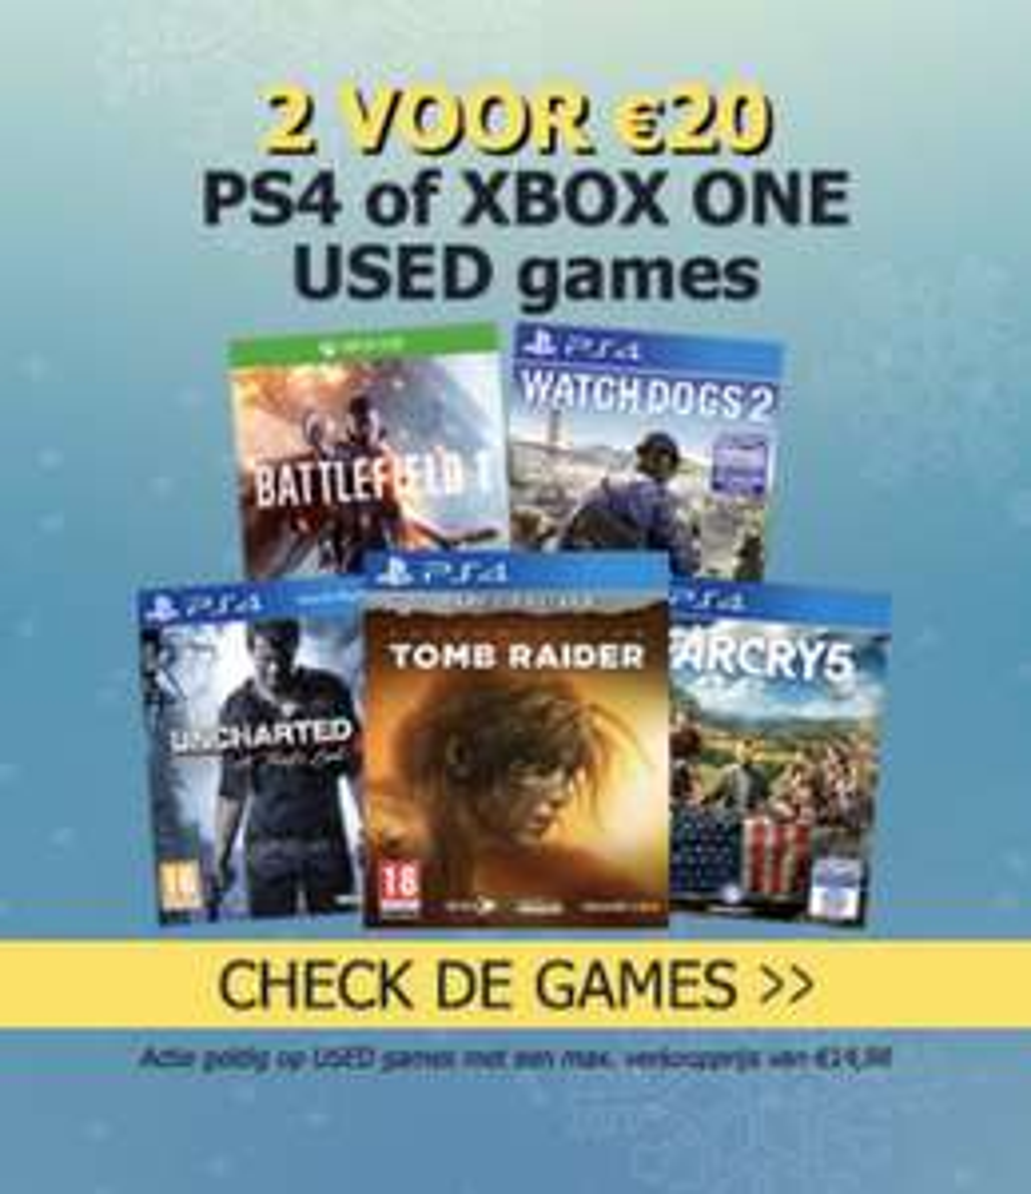 PlayStation 4 en Xbox one games 2 voor €20,00 Gamemania